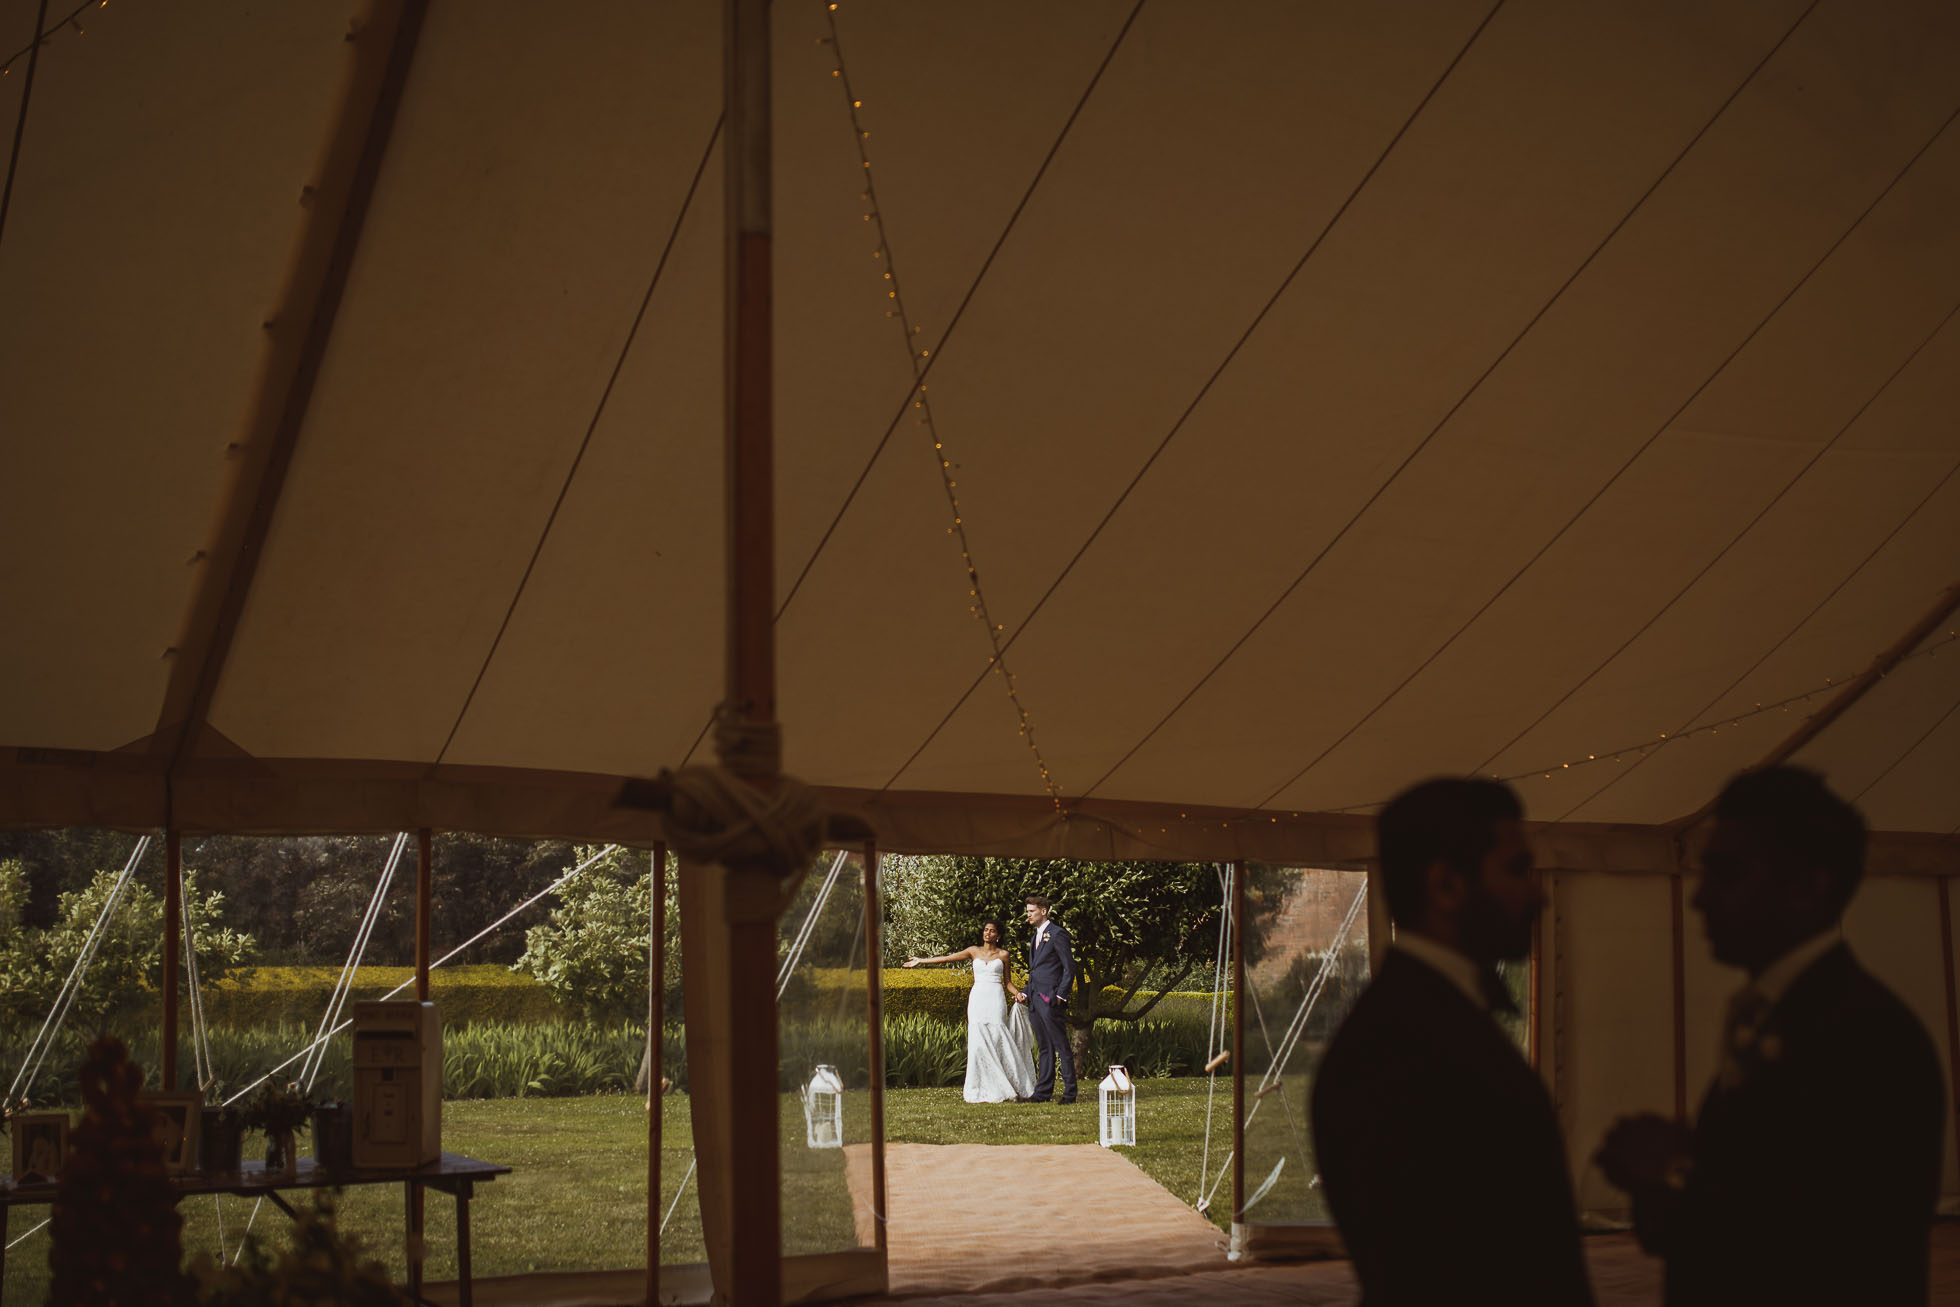 norton_conyers_wedding_photographer-58.jpg